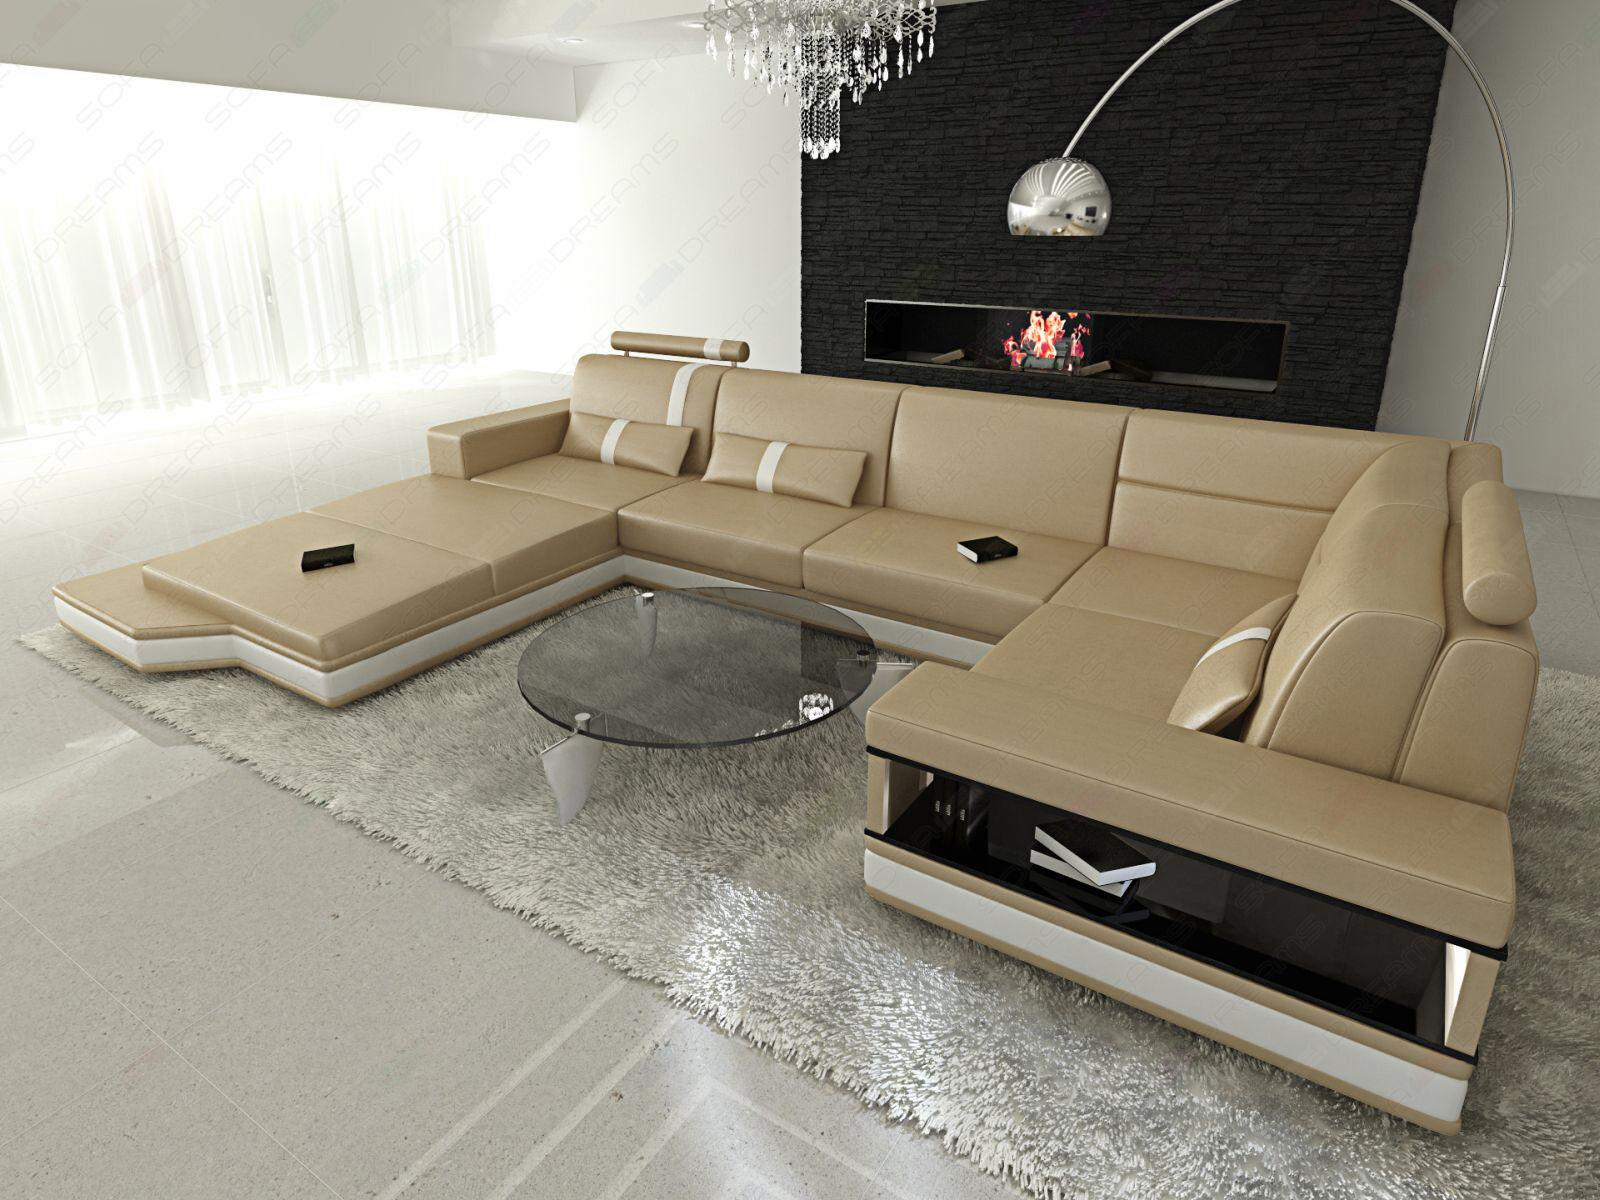 ledersofa messana designer sofa wohnlandschaft licht eur picclick de. Black Bedroom Furniture Sets. Home Design Ideas